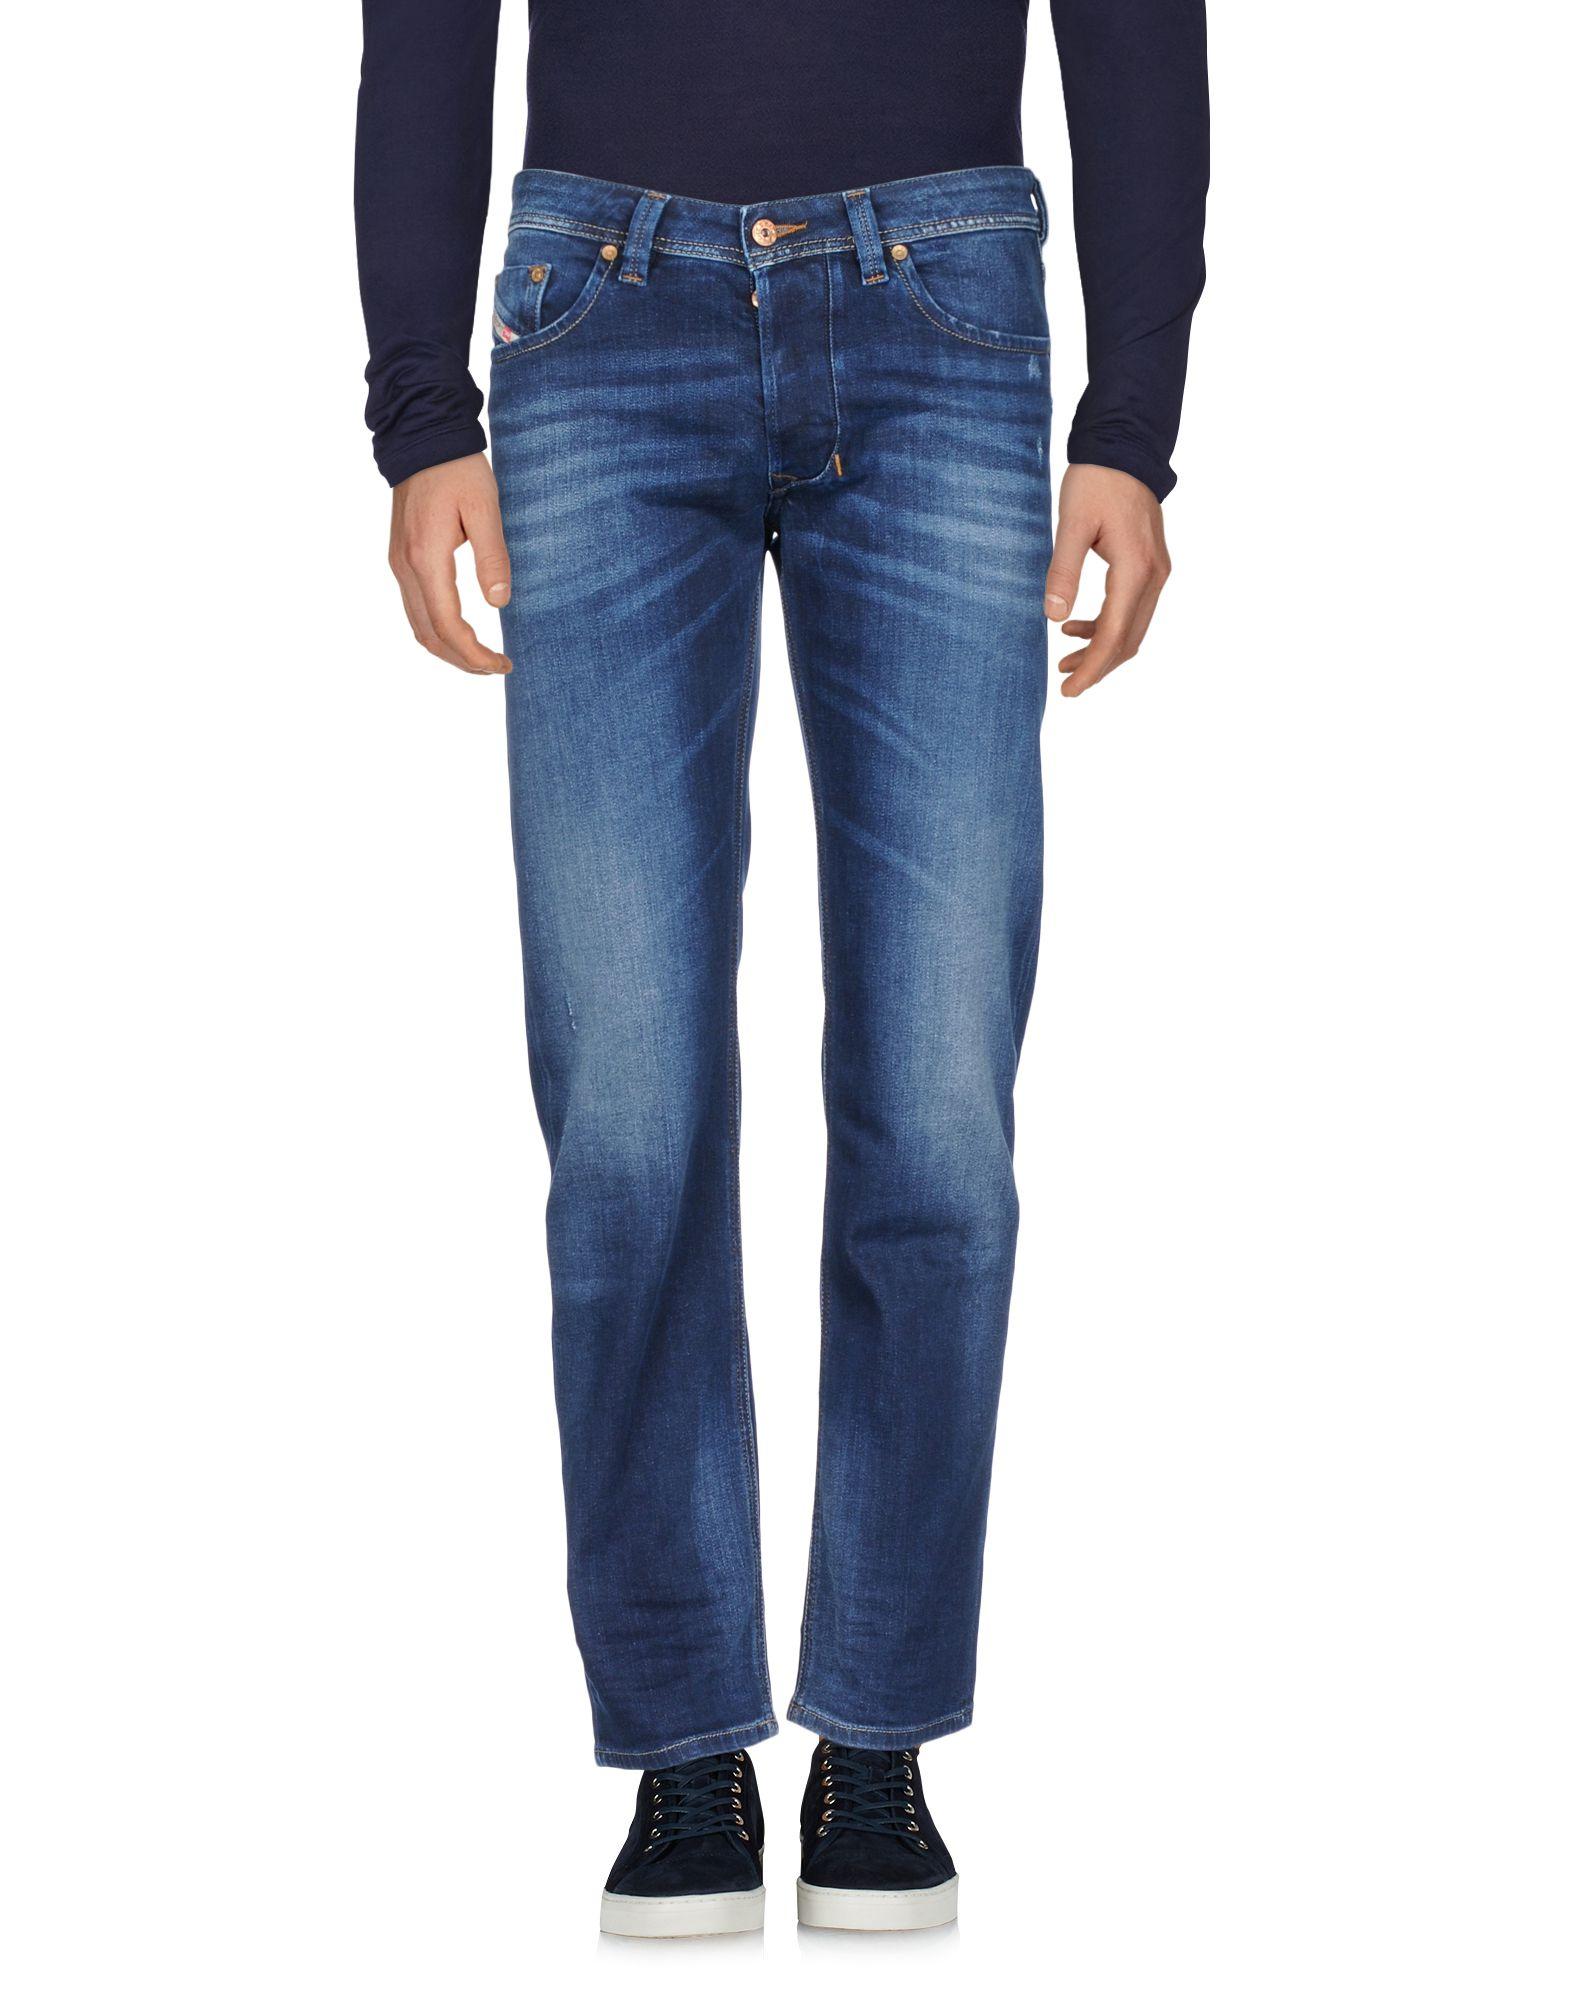 Pantaloni - Jeans Diesel Uomo - Pantaloni 42678312FU f85db1